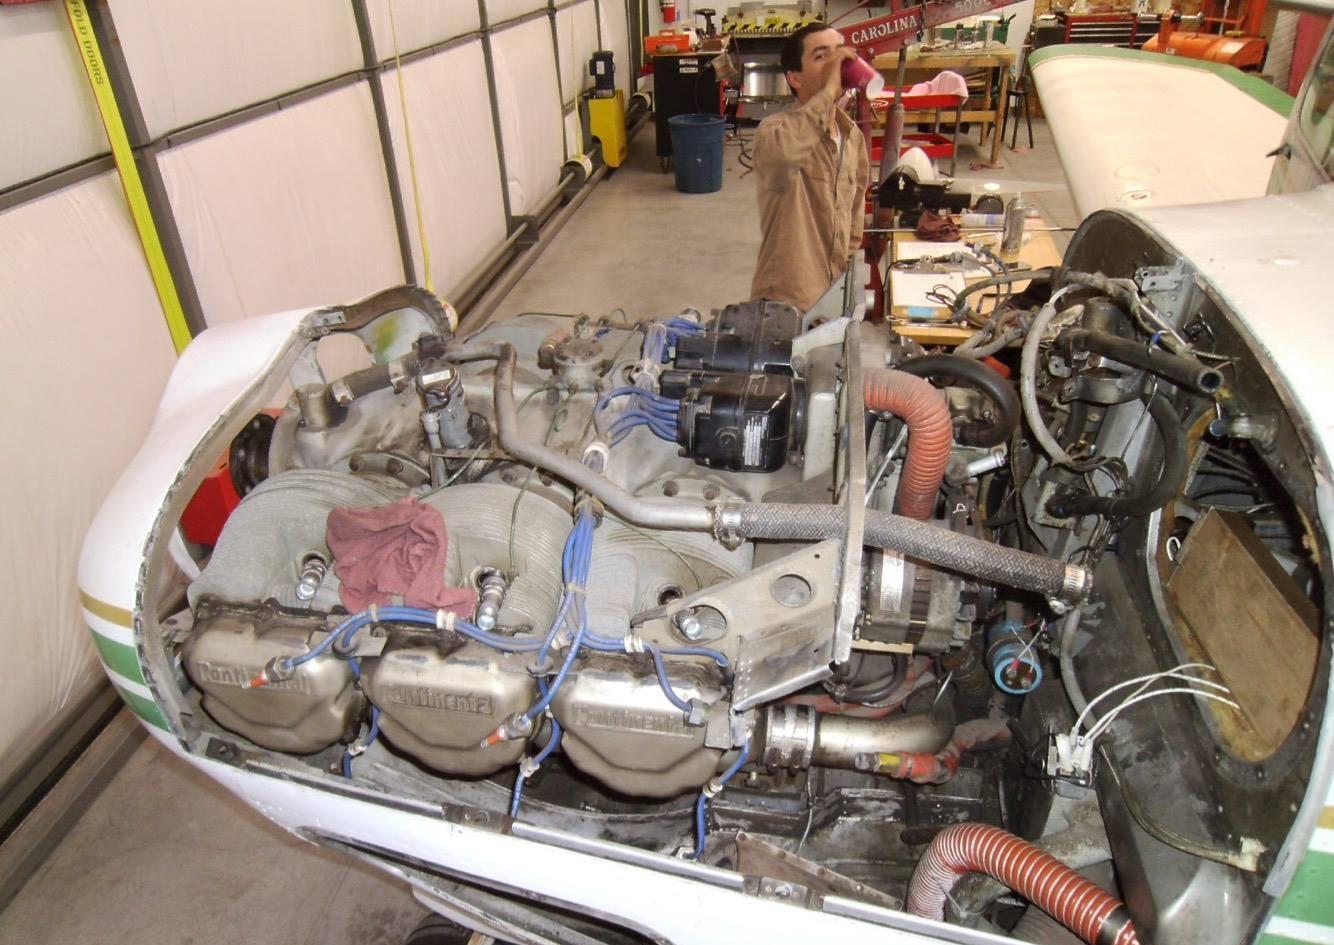 Starting to remove original engine